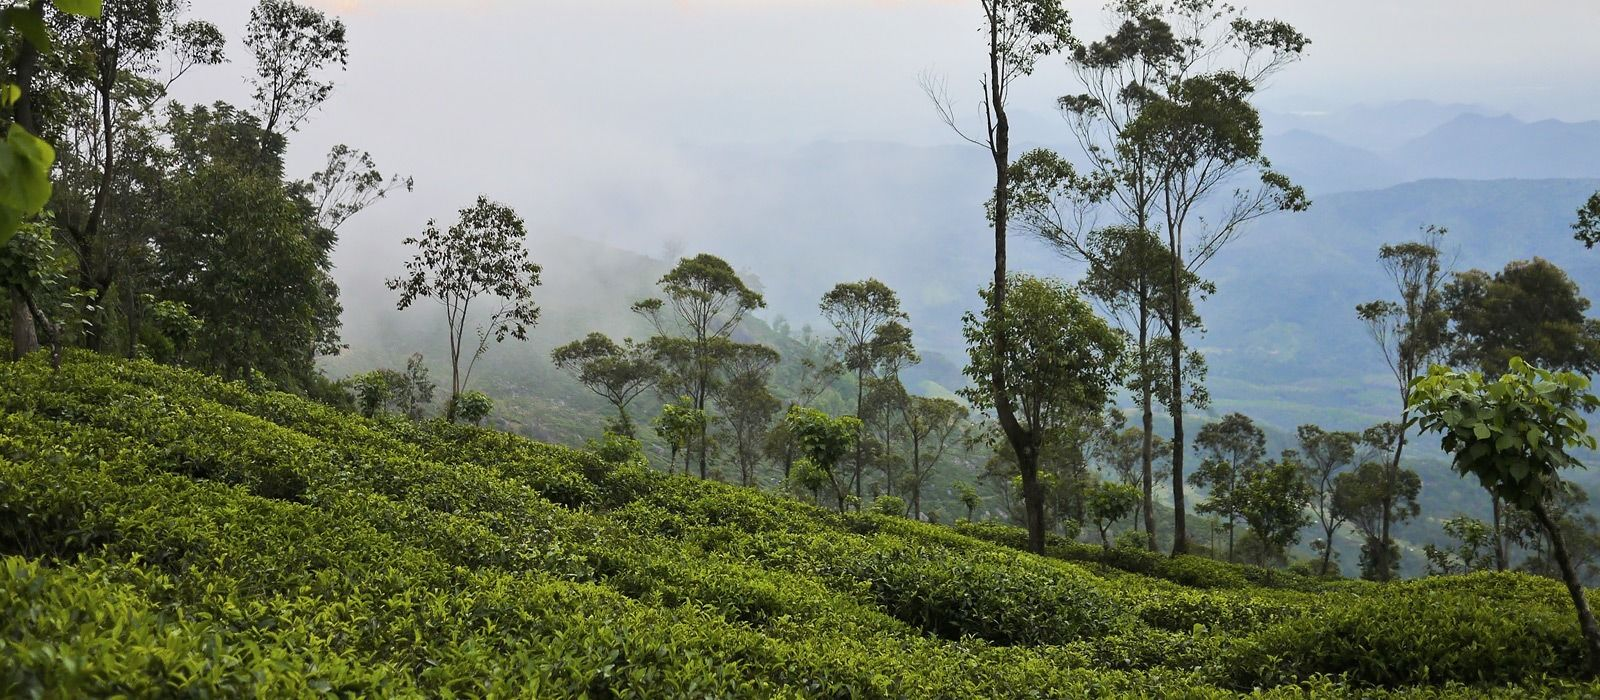 Reiseziel Hatton Sri Lanka